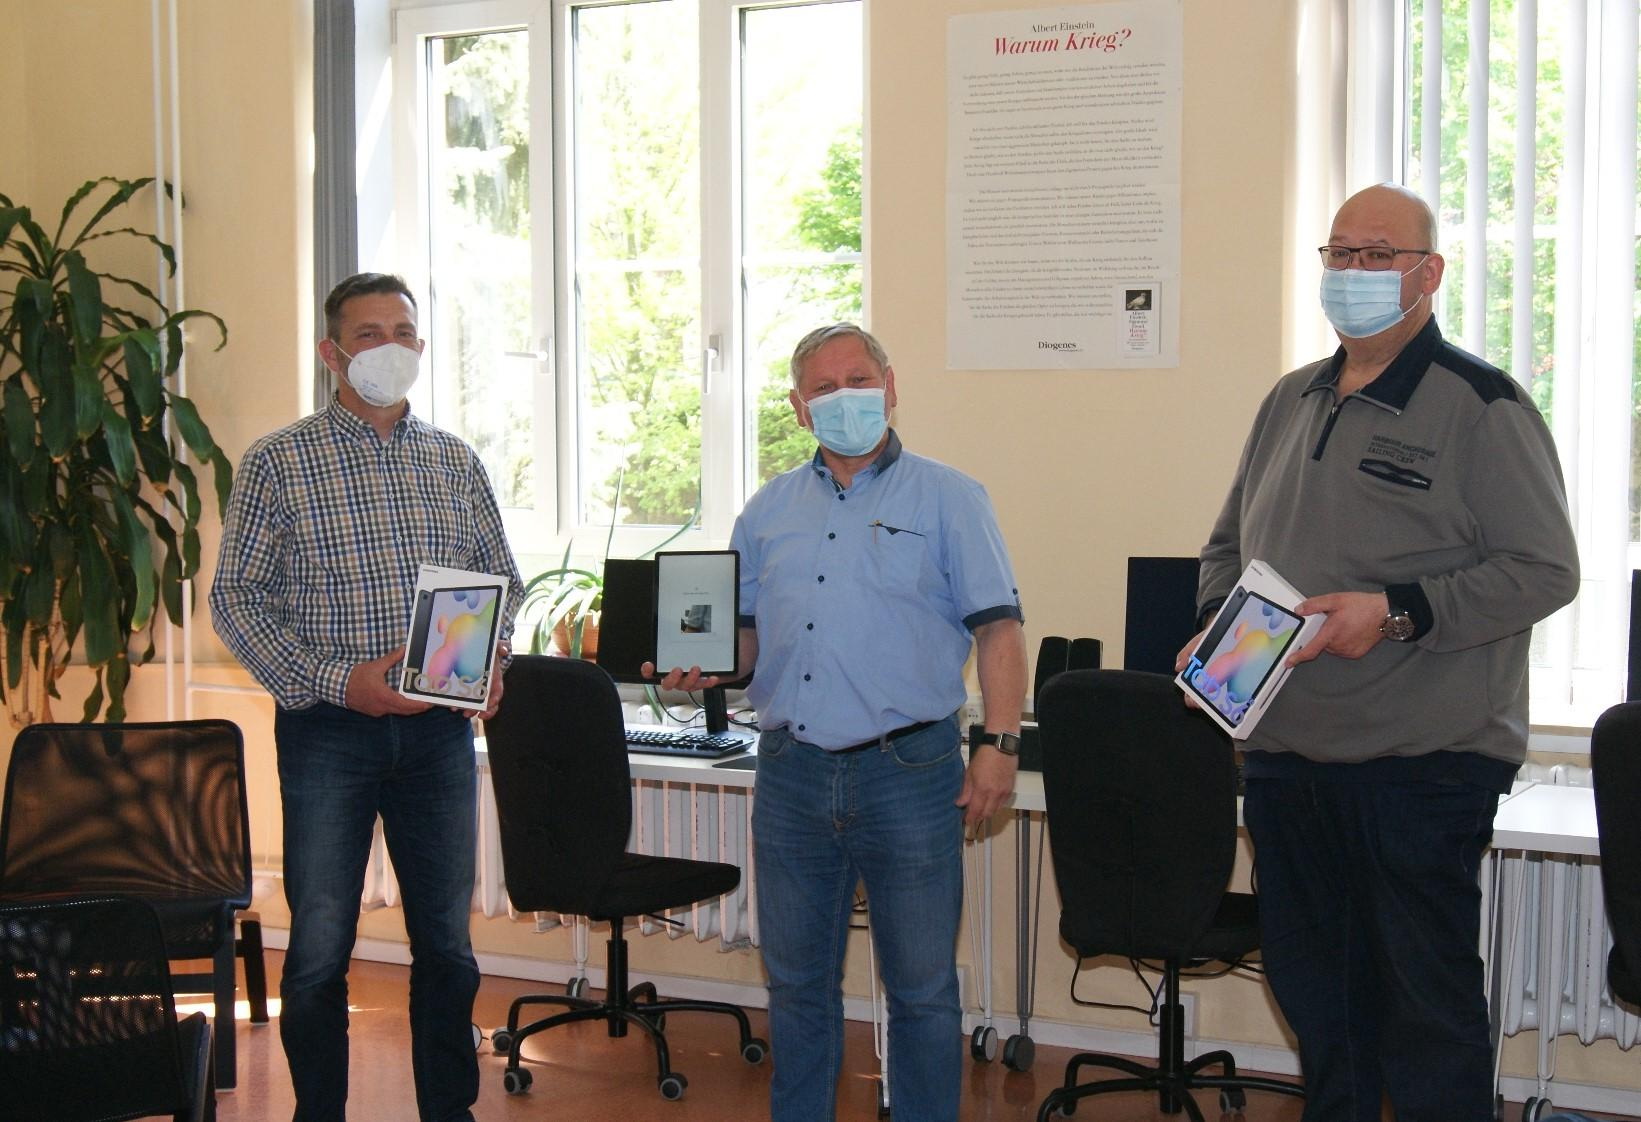 v.l.n.r.: Amtsdirektor David Kaluza, Schulleiter Henri Kuhl, Bürgermeister Thomas Willweber